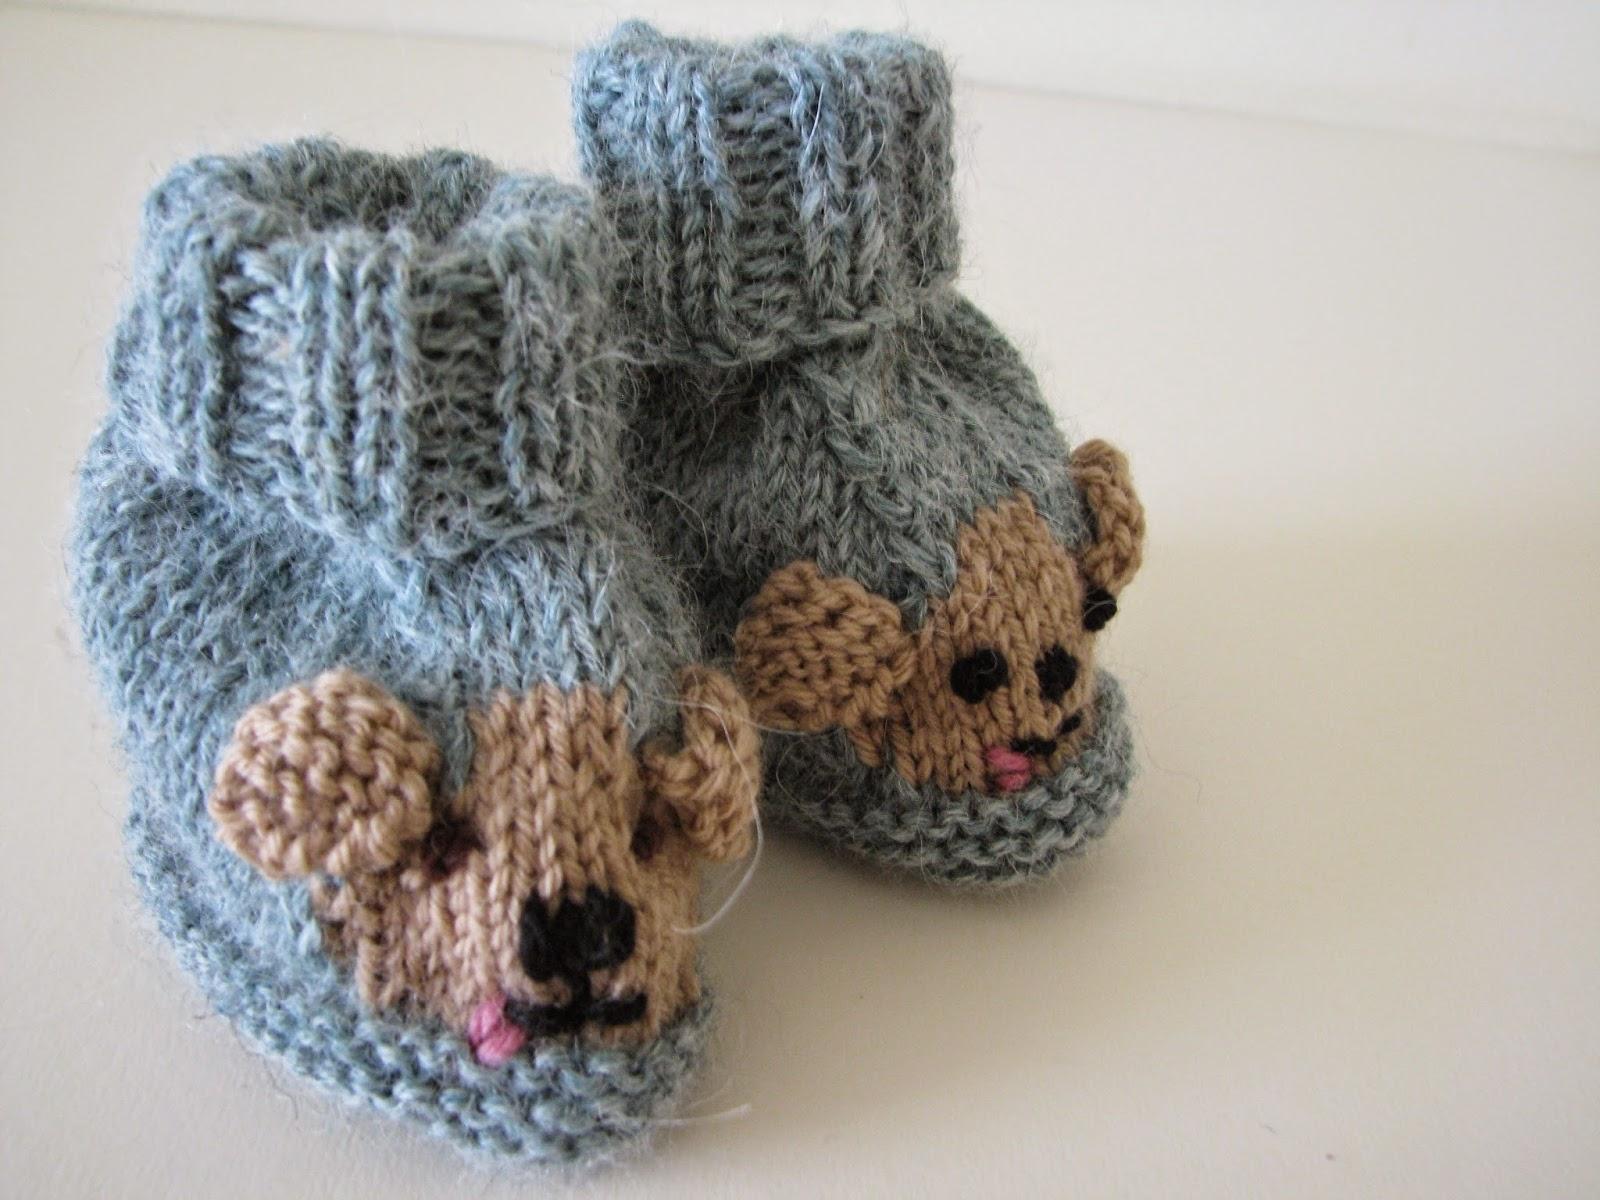 Knitting Holidays Uk : Knitting and crochet workshops retreats